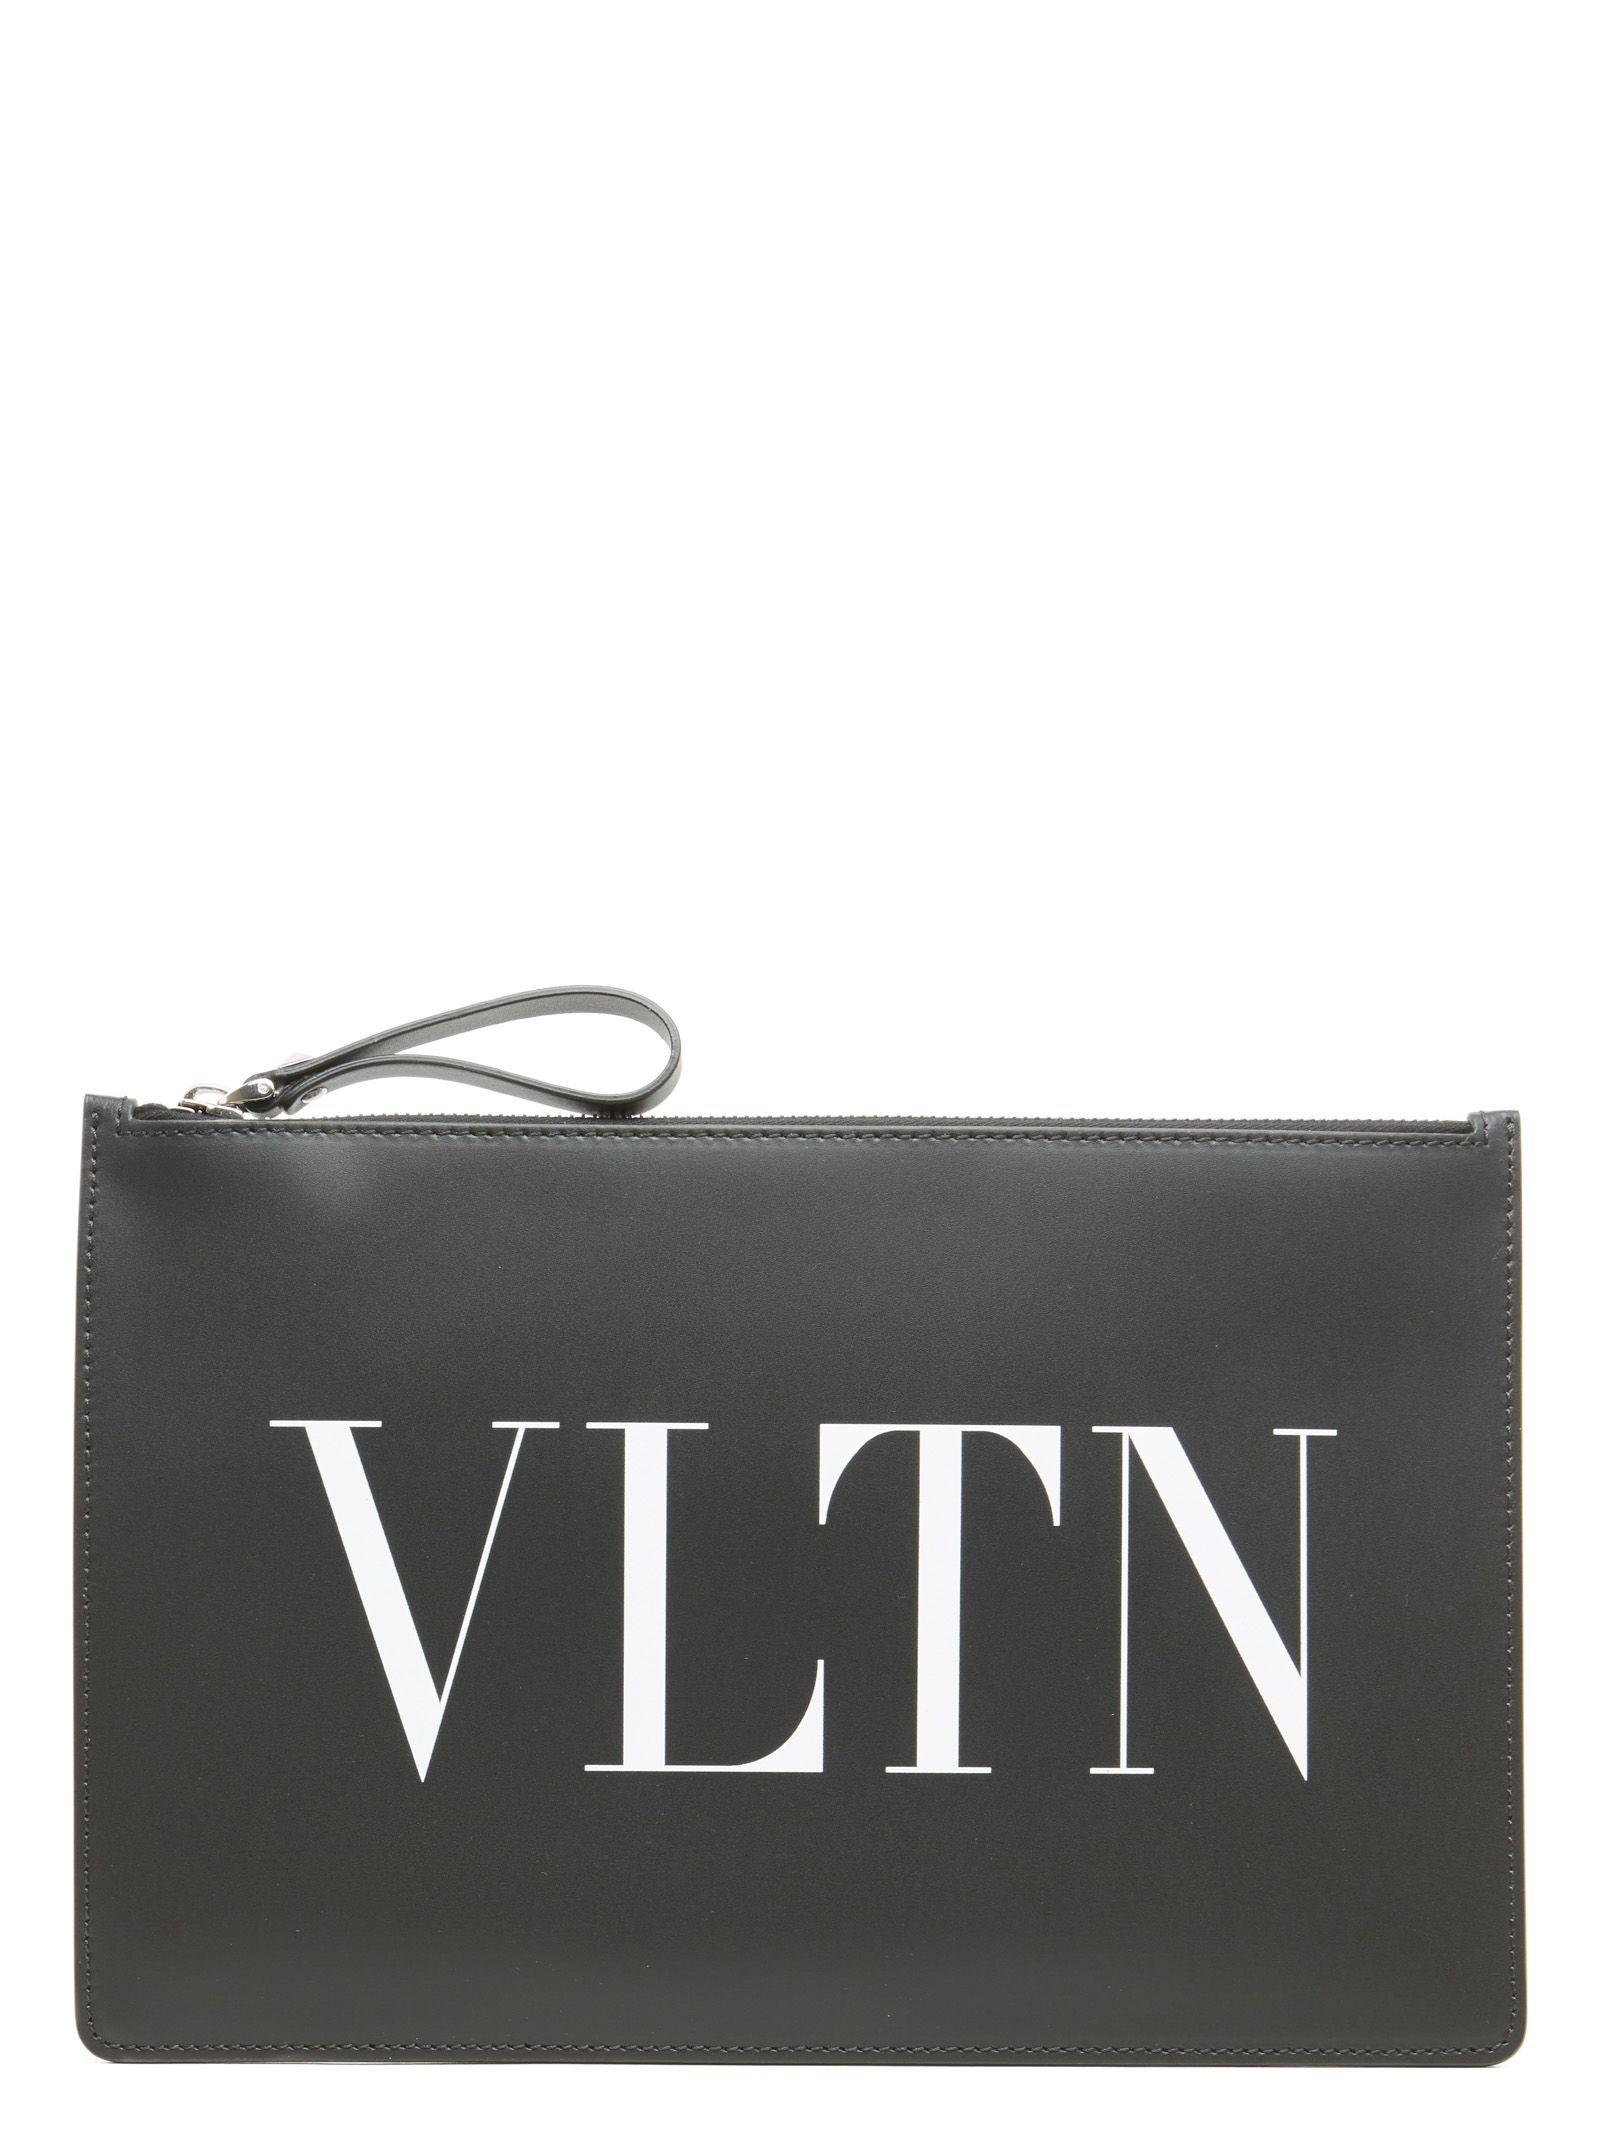 VALENTINO VLNT BAG